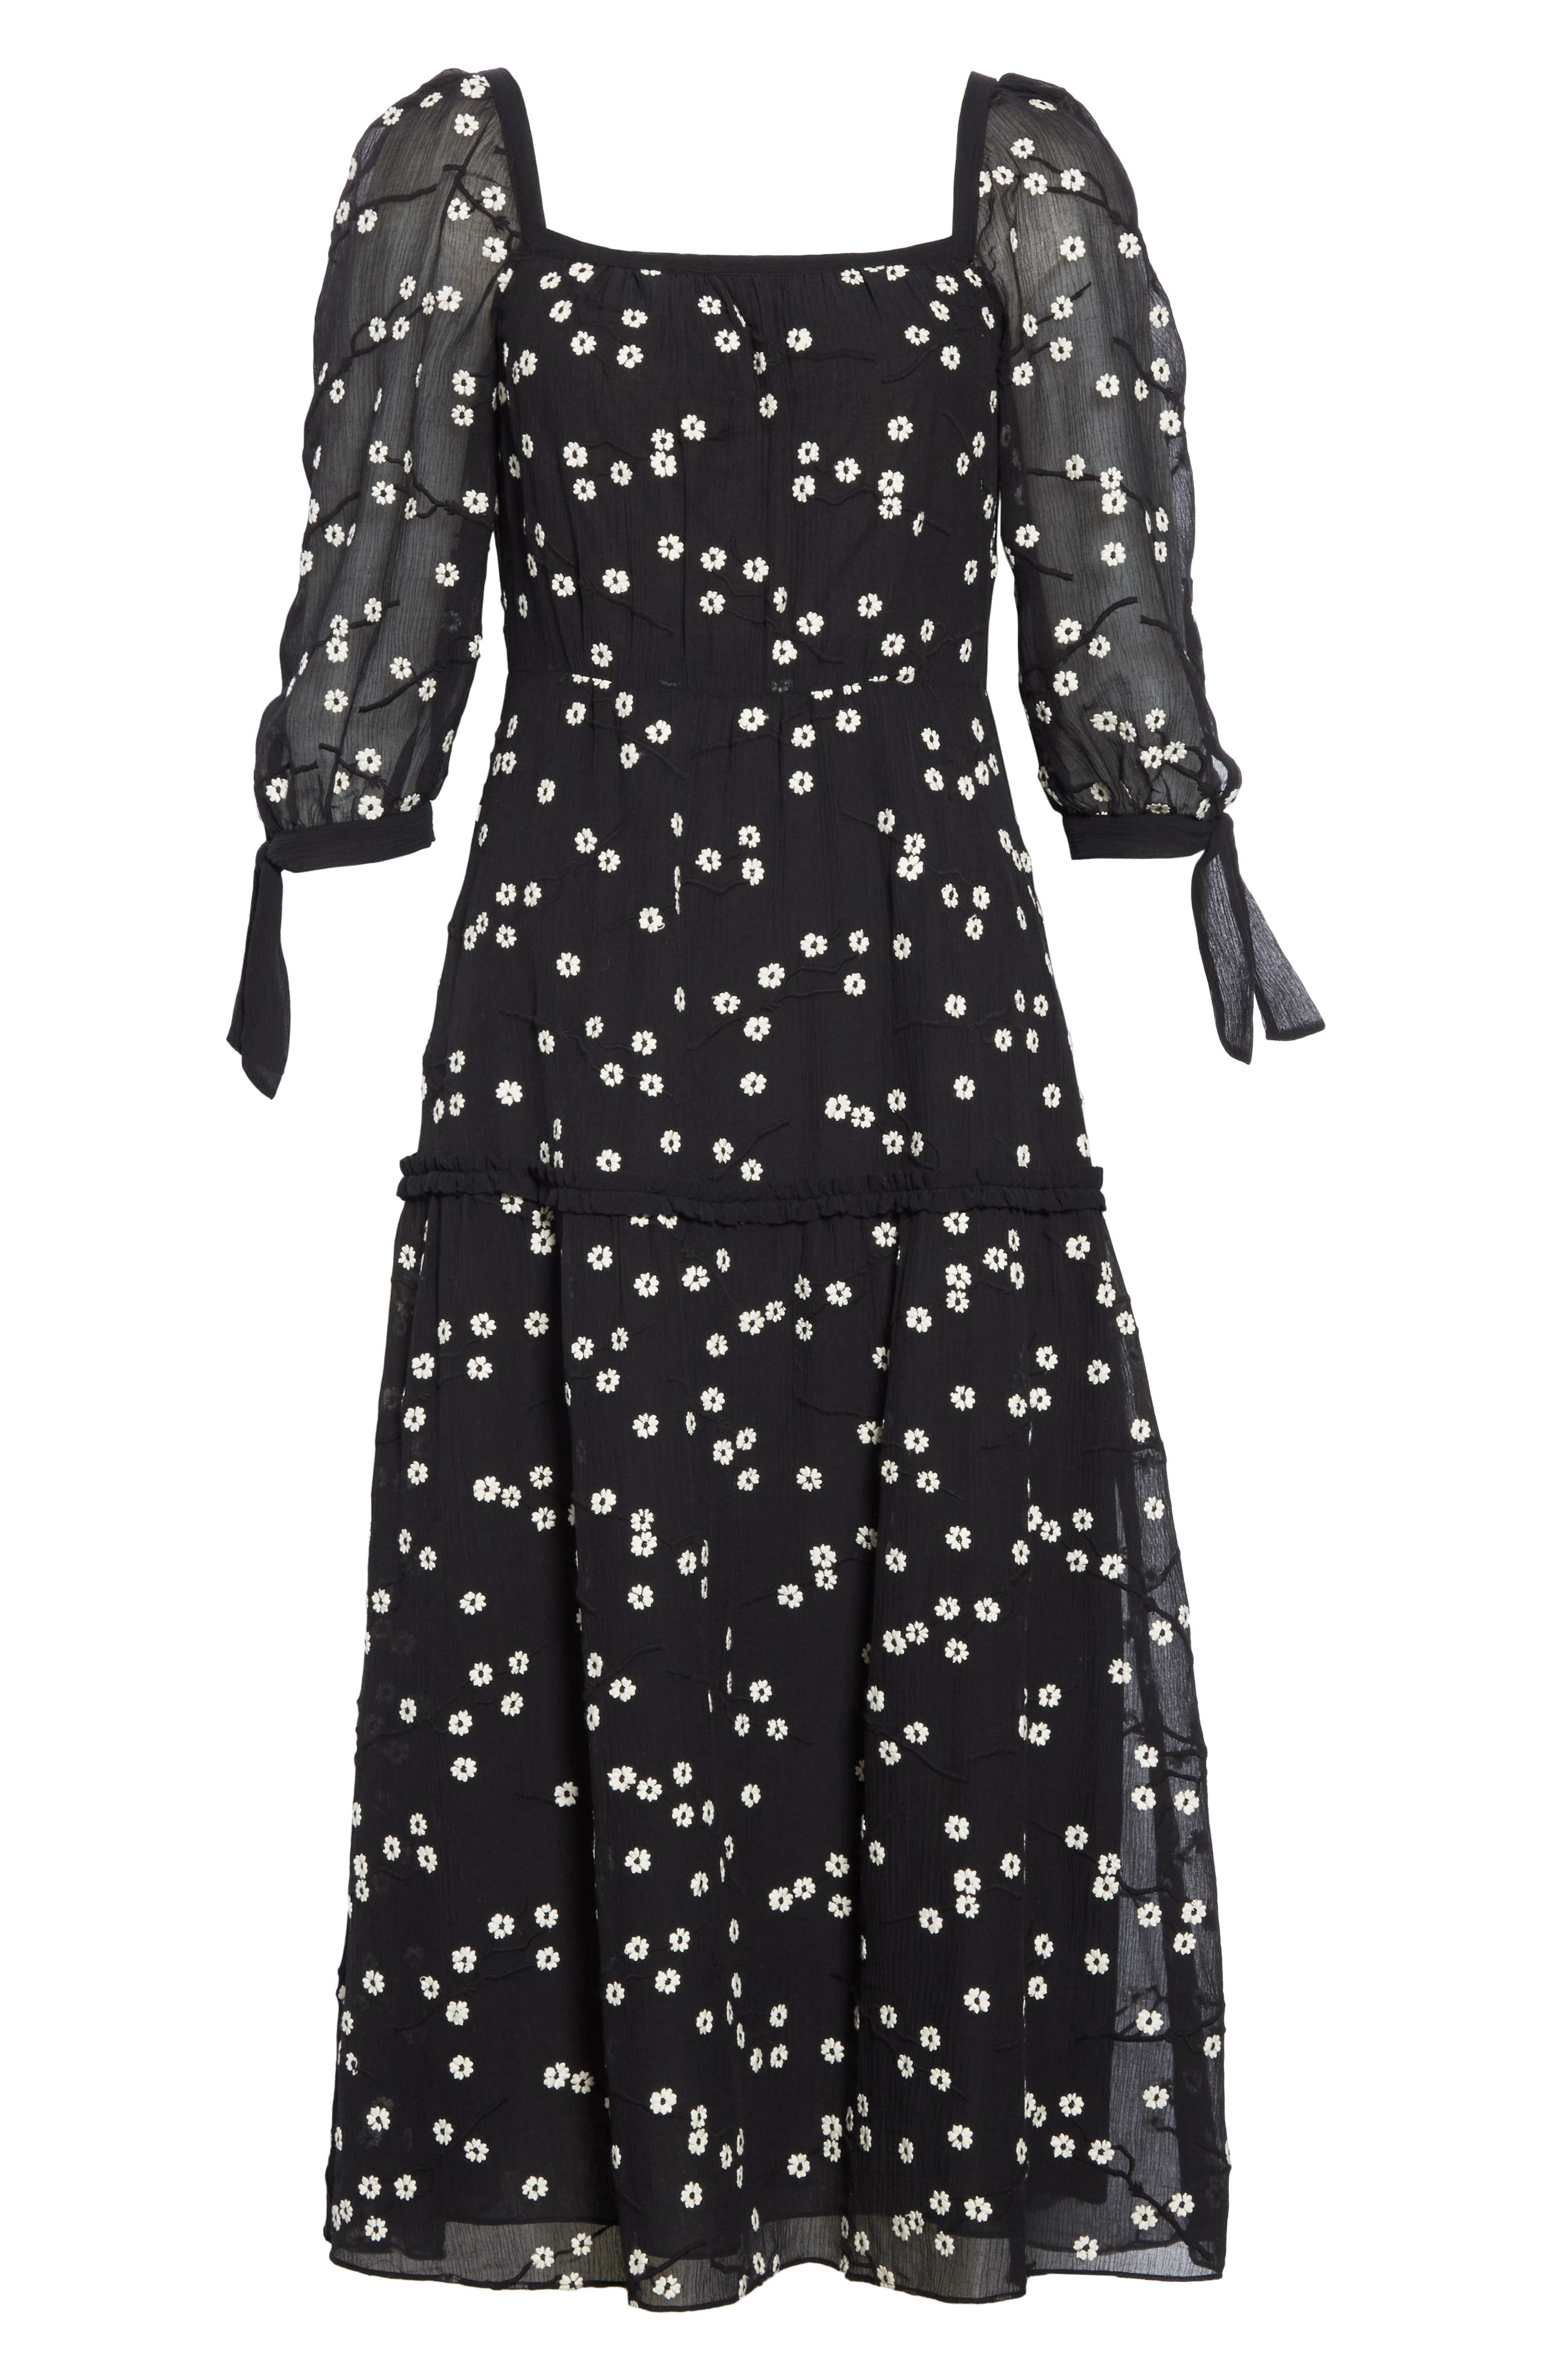 REBECCA TAYLOR, Allessandra Midi Dress, Alternate thumbnail 7, color, BLACK COMBO